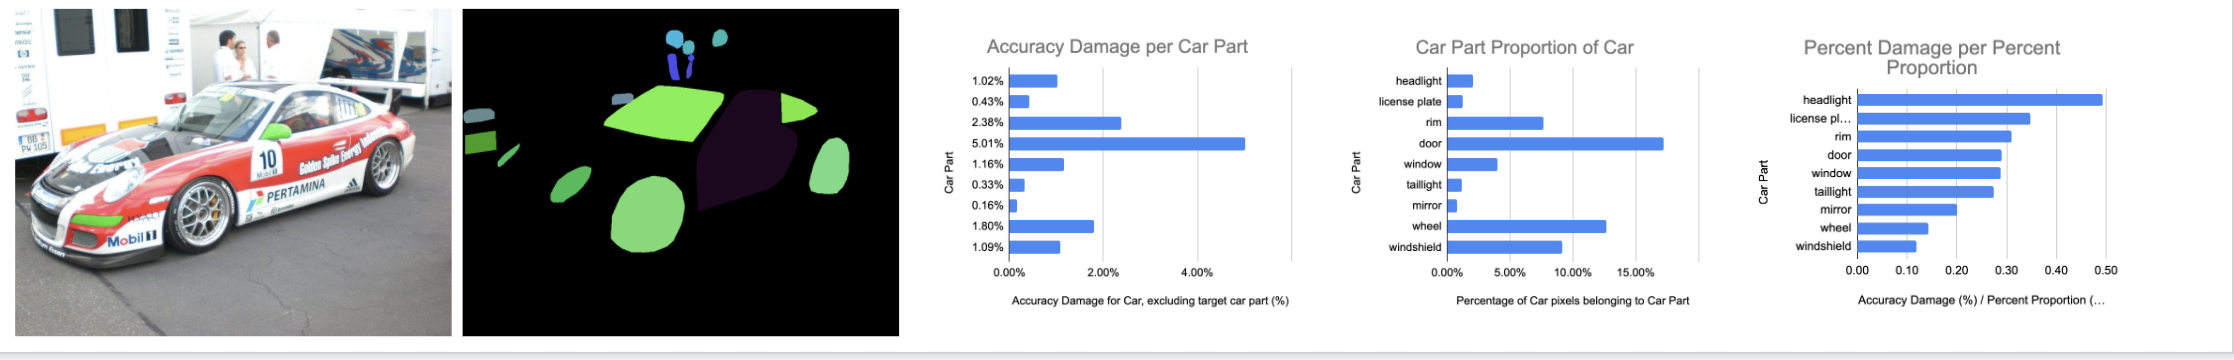 car_part_analysis